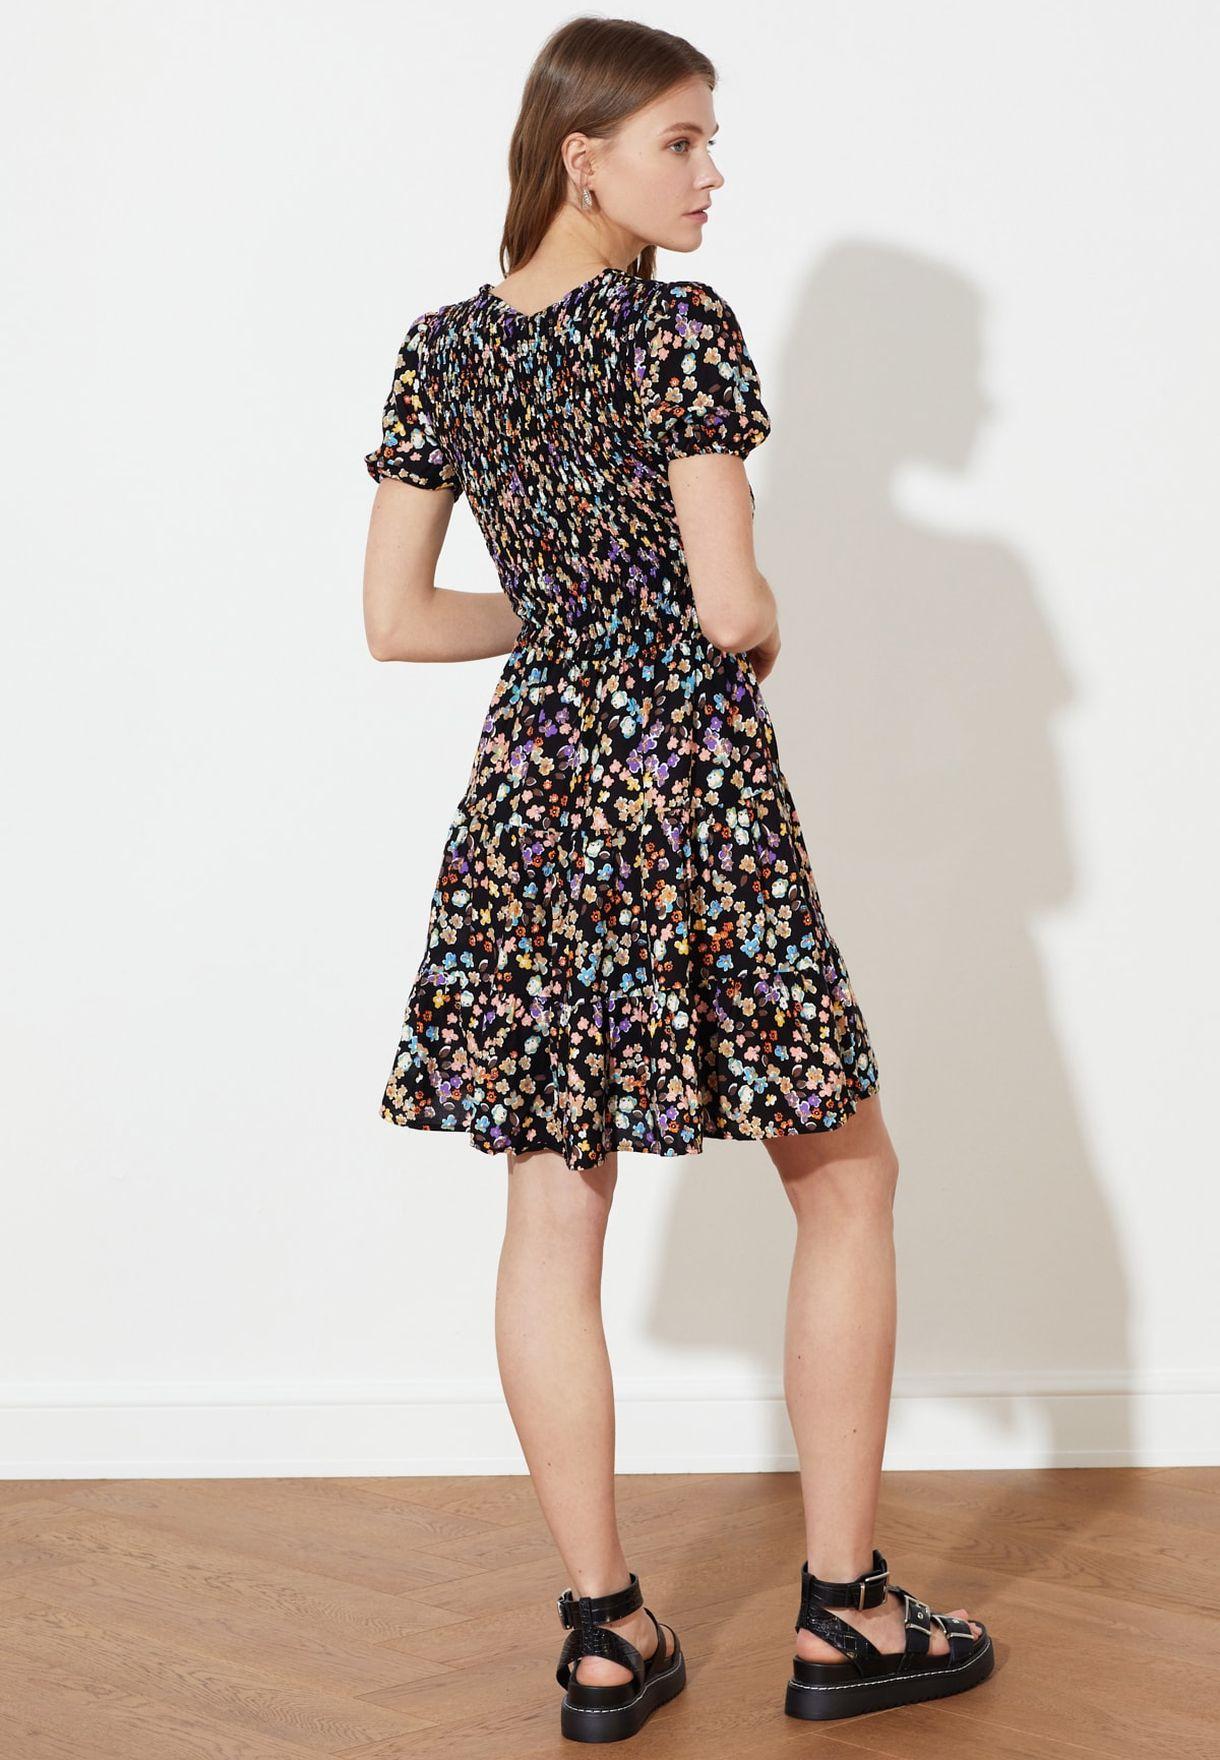 Square Neck Printed Dress